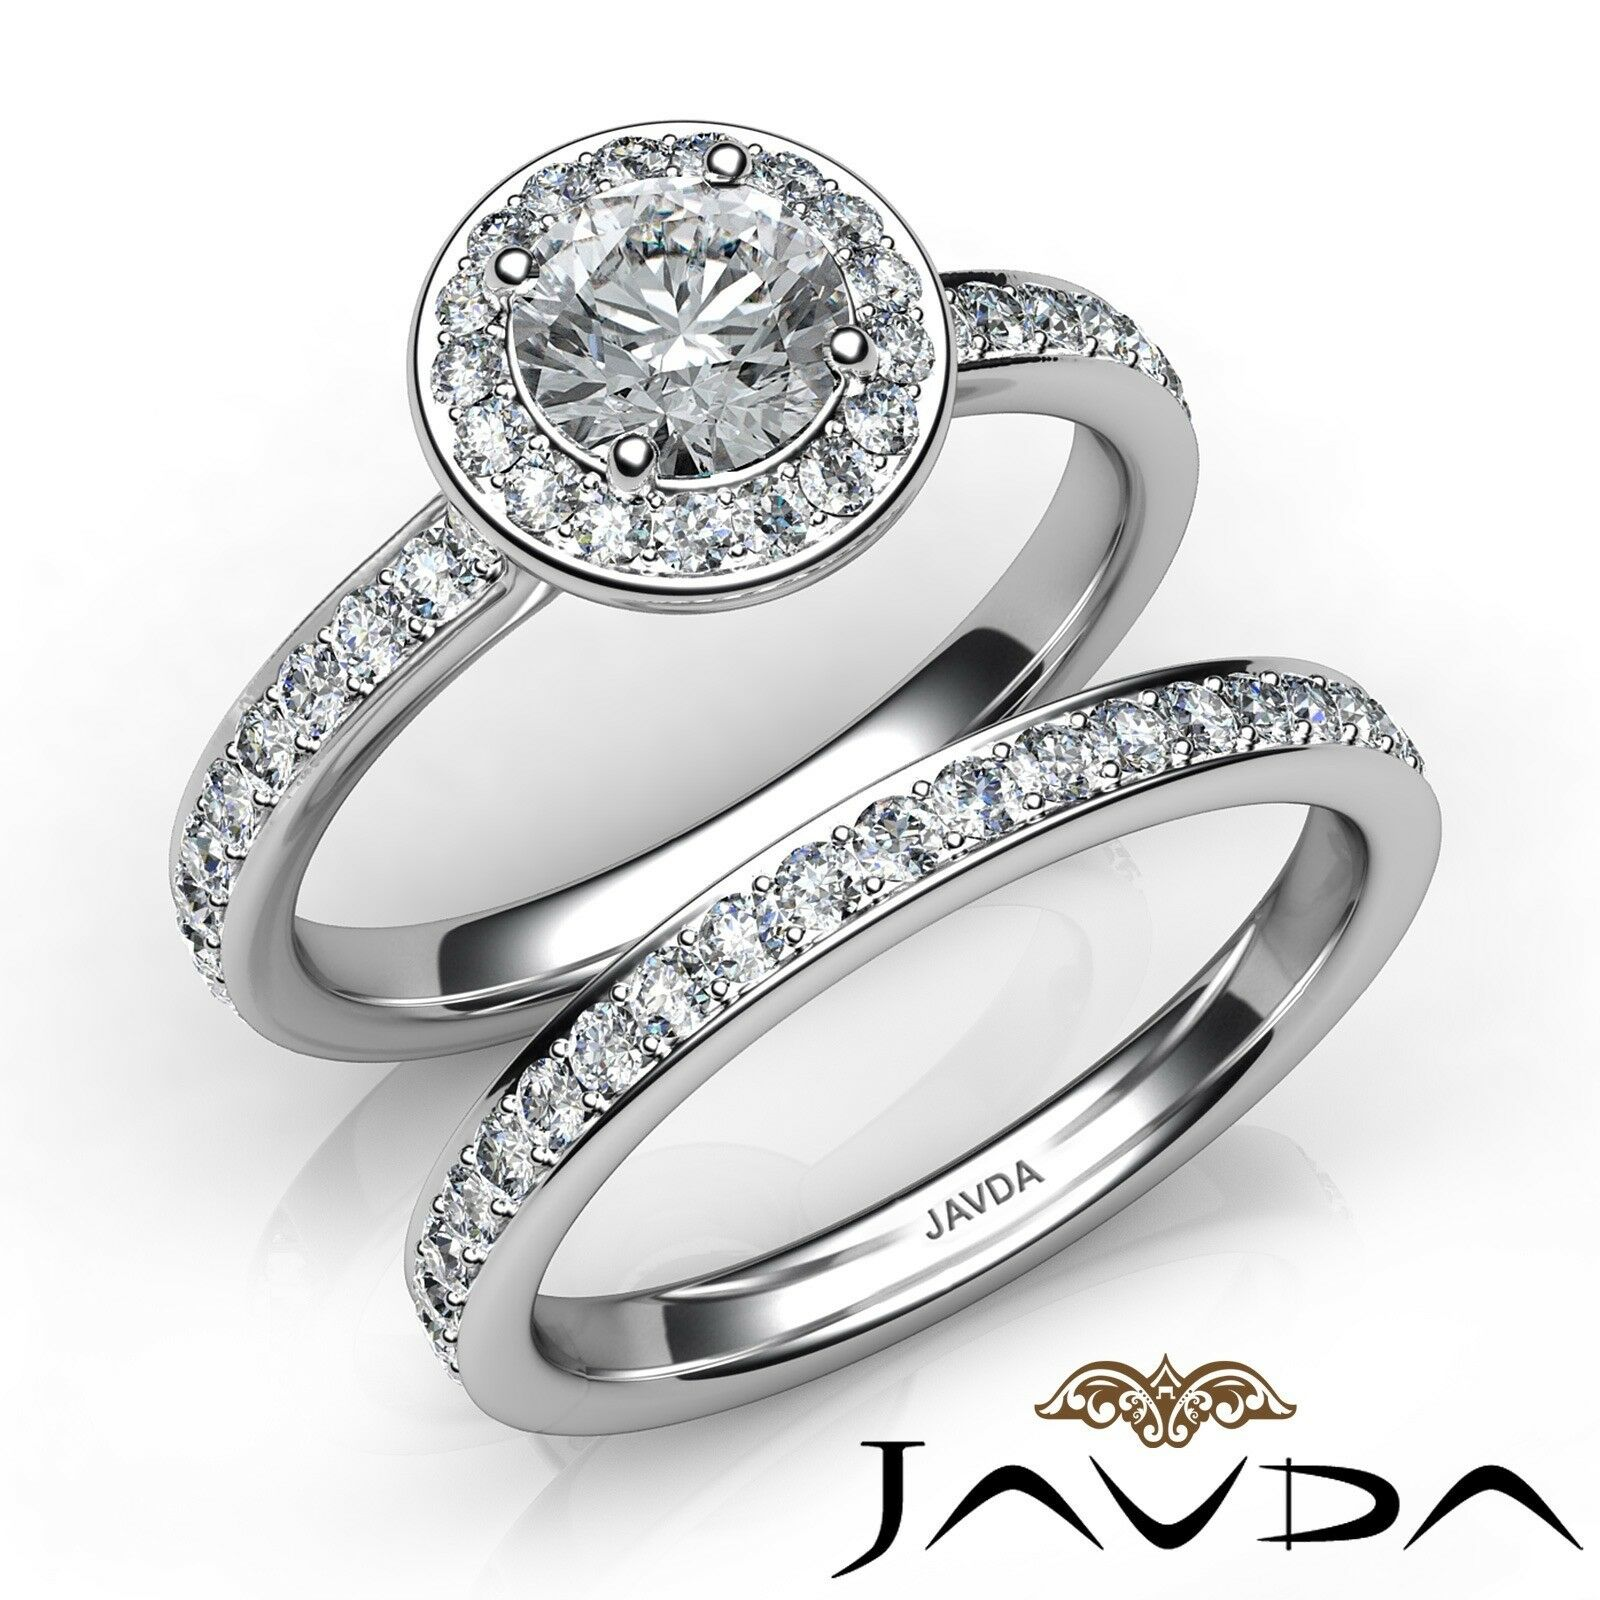 1.65ctw Halo Pave Wedding Round Diamond Engagement Ring GIA H-VVS2 White Gold